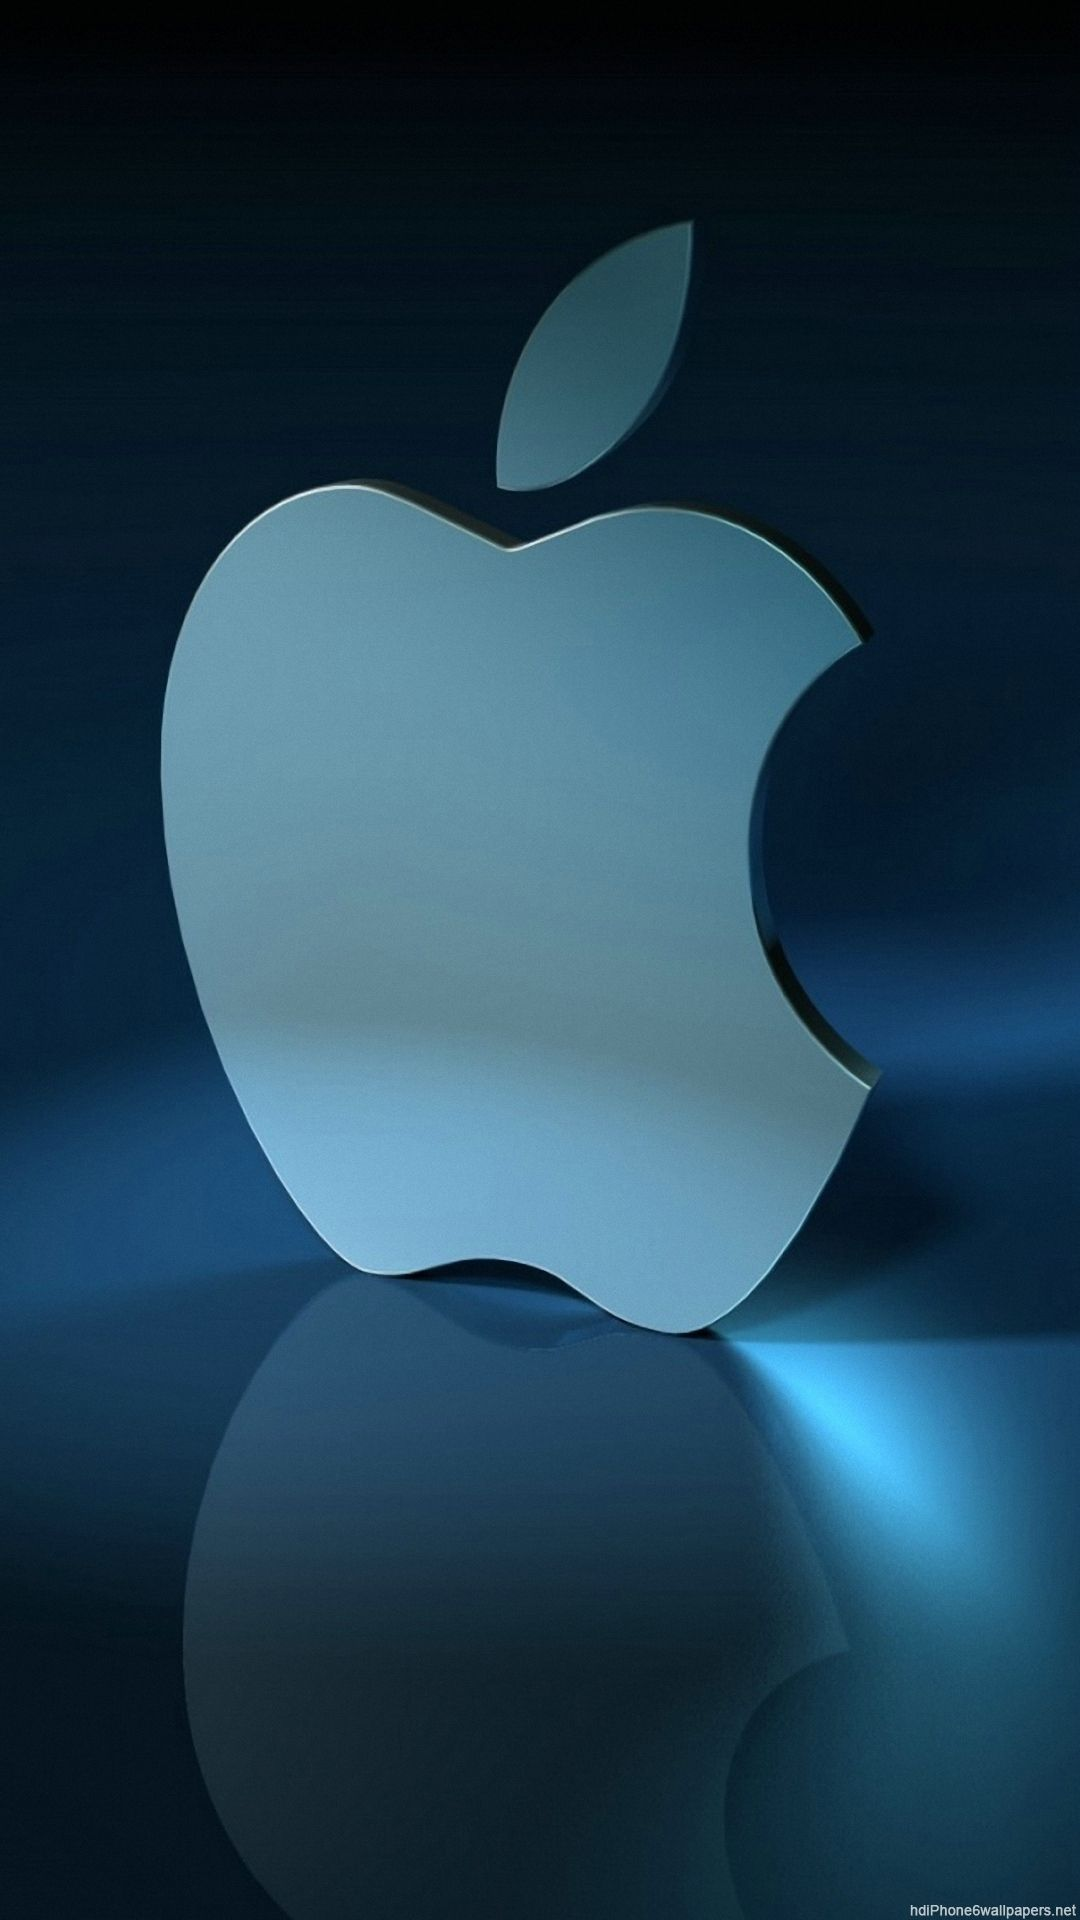 Wallpaper download iphone - Black Glossy Apple Logo Iphone Wallpaper Hd Iphone 5 Wallpapers